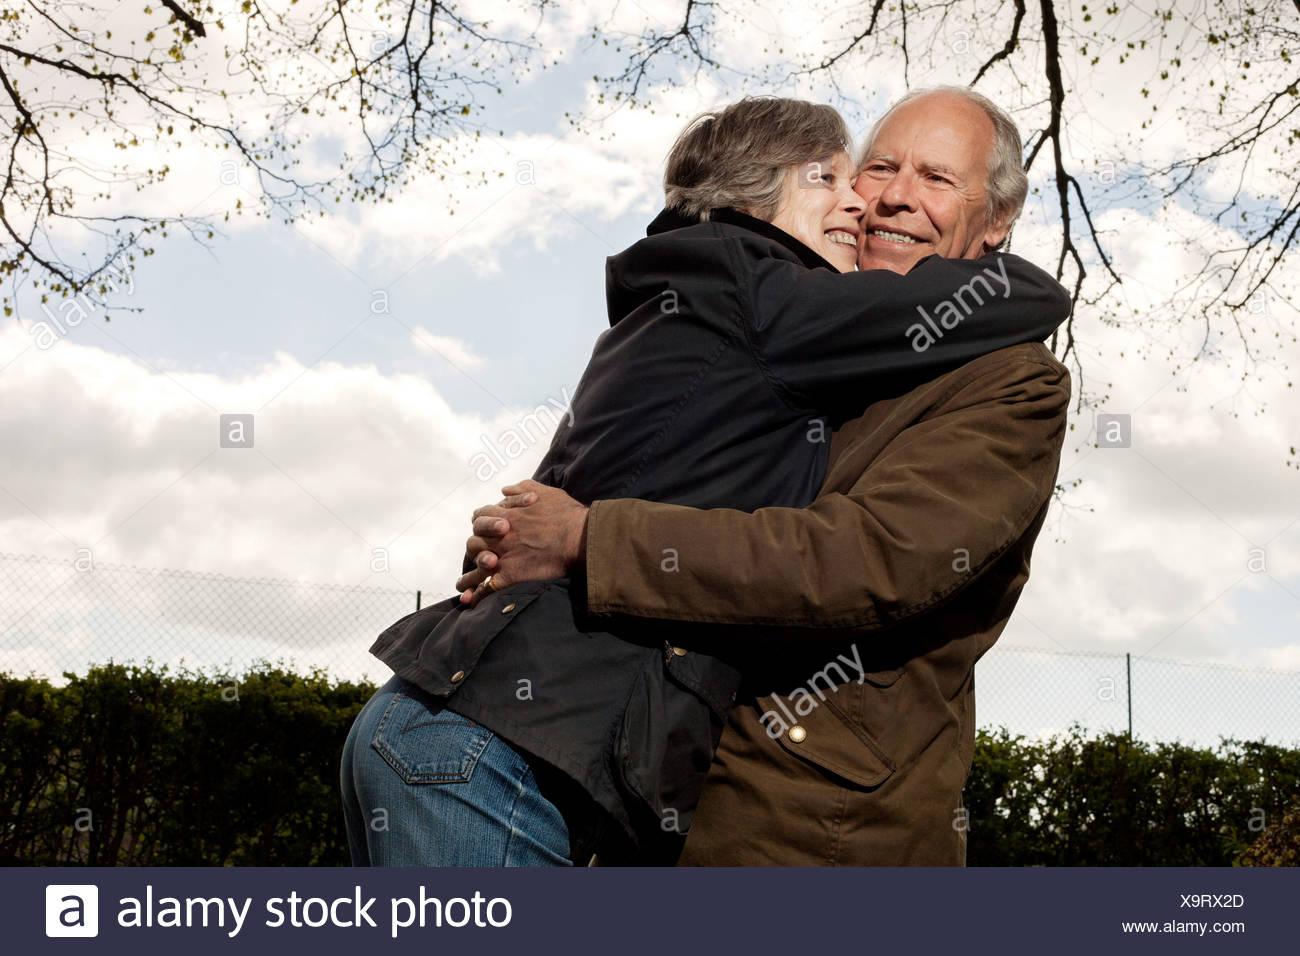 Frau umarmt Mann Rundhals-Ausschnitt Stockbild